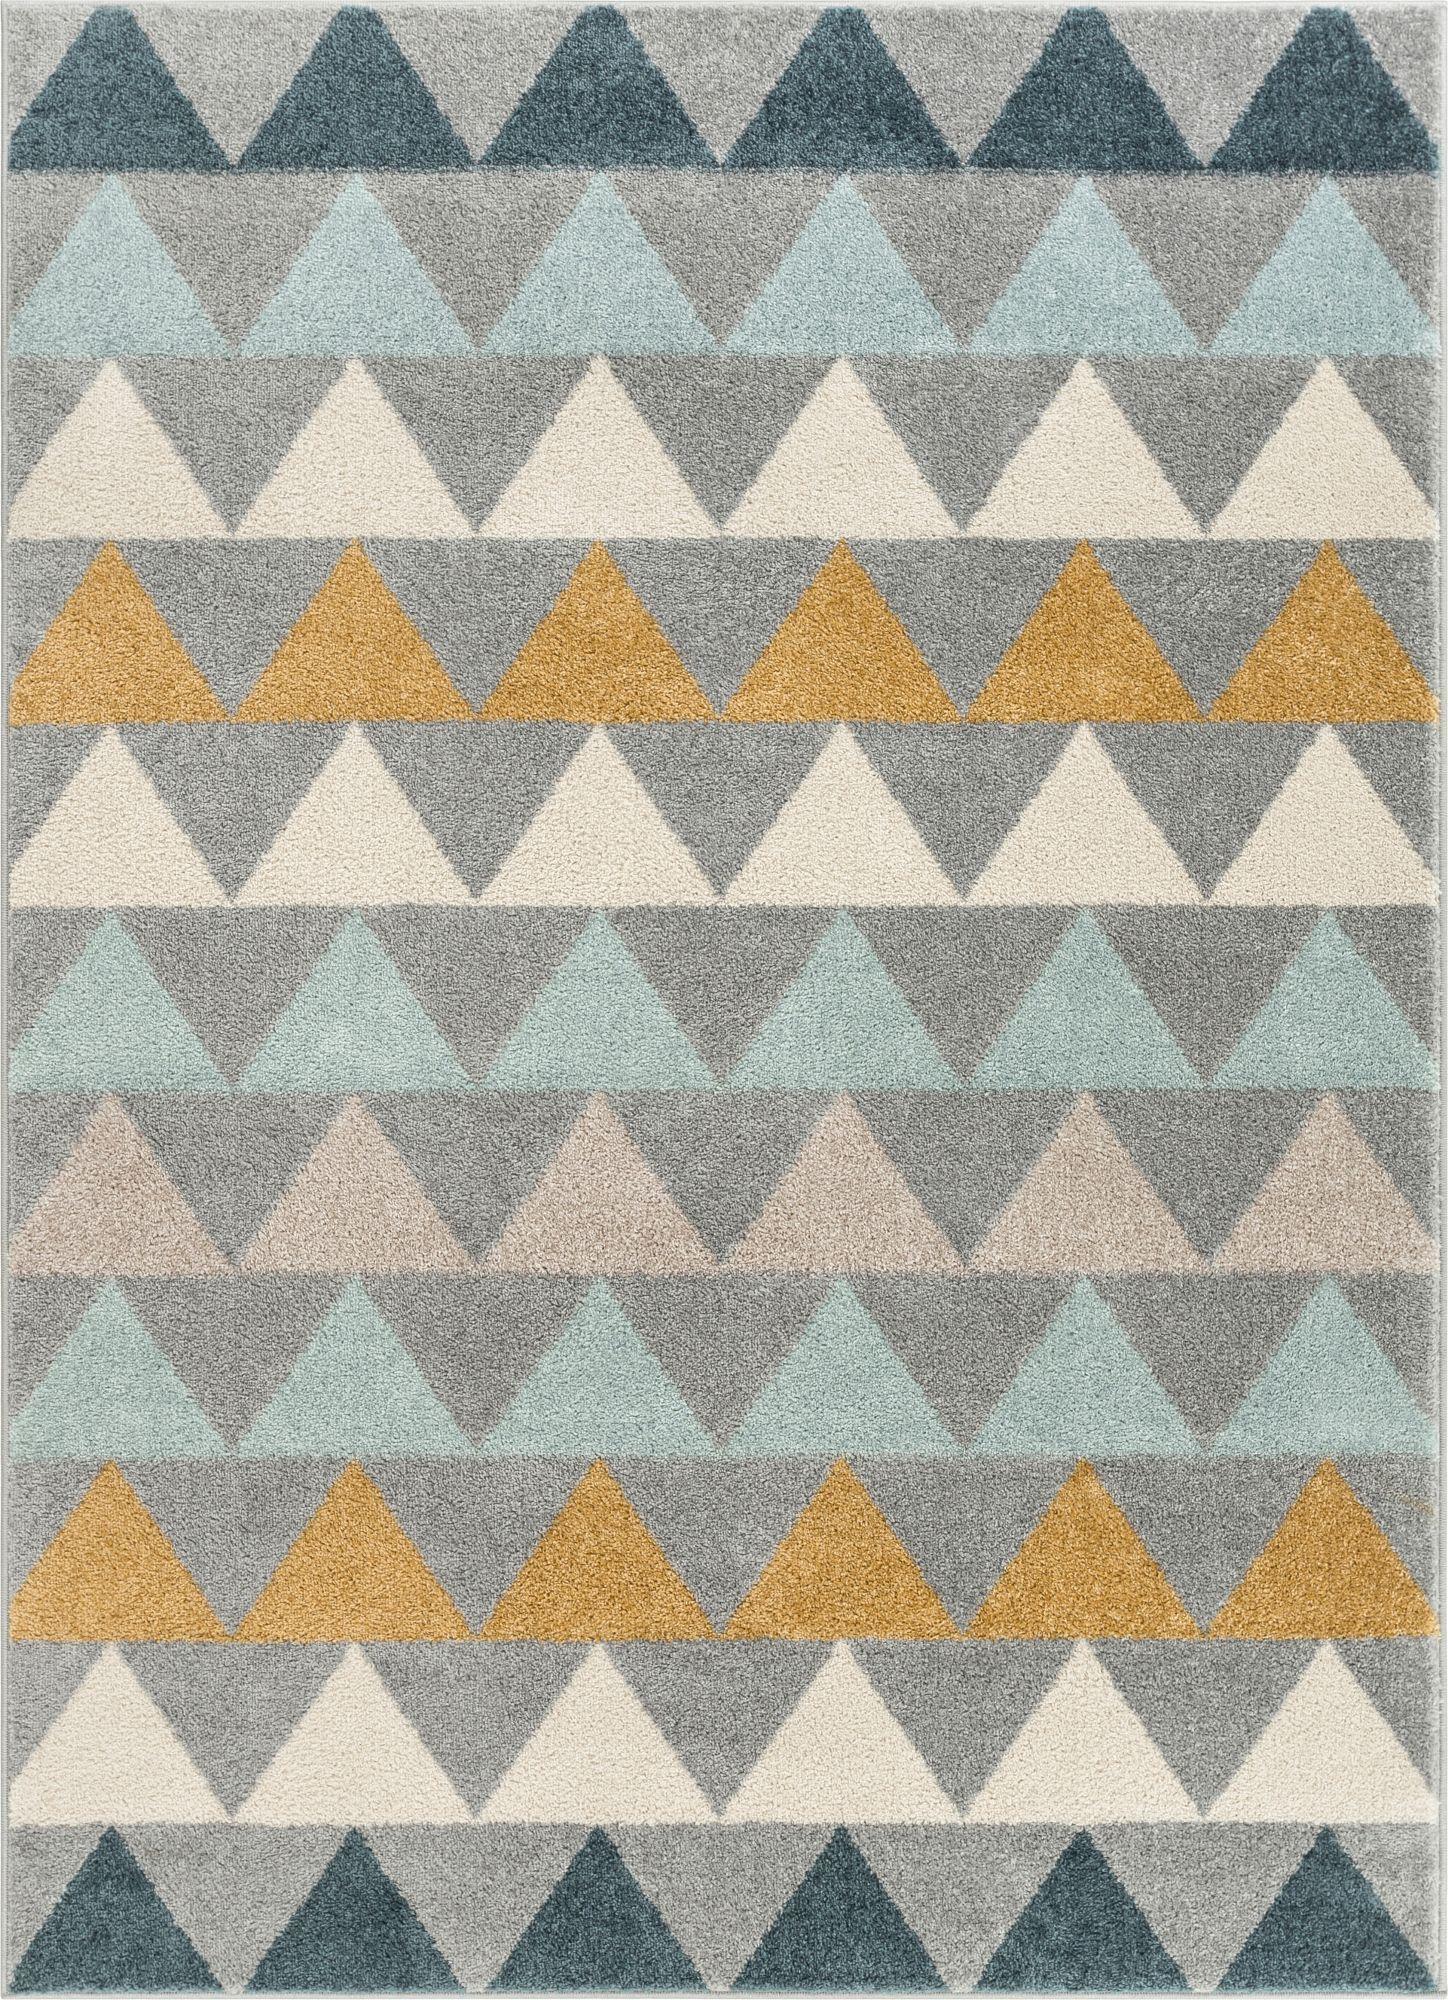 Nova Grey Modern Scandinavian Rug Scandinavian Rug Well Woven Grey Geometric Rug